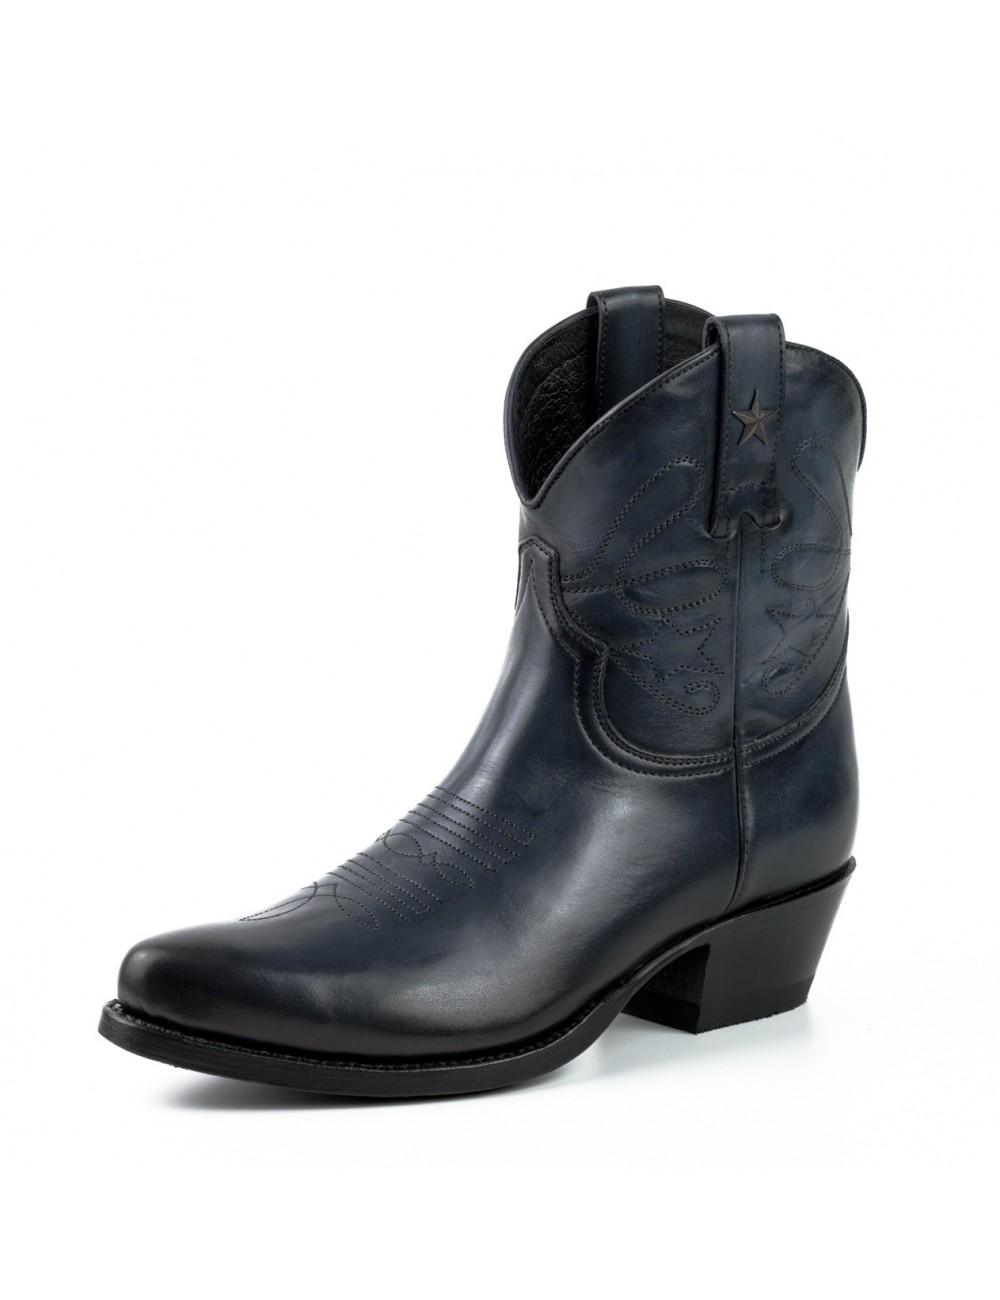 Bottines western & bottines cowboy femme Acheter en ligne